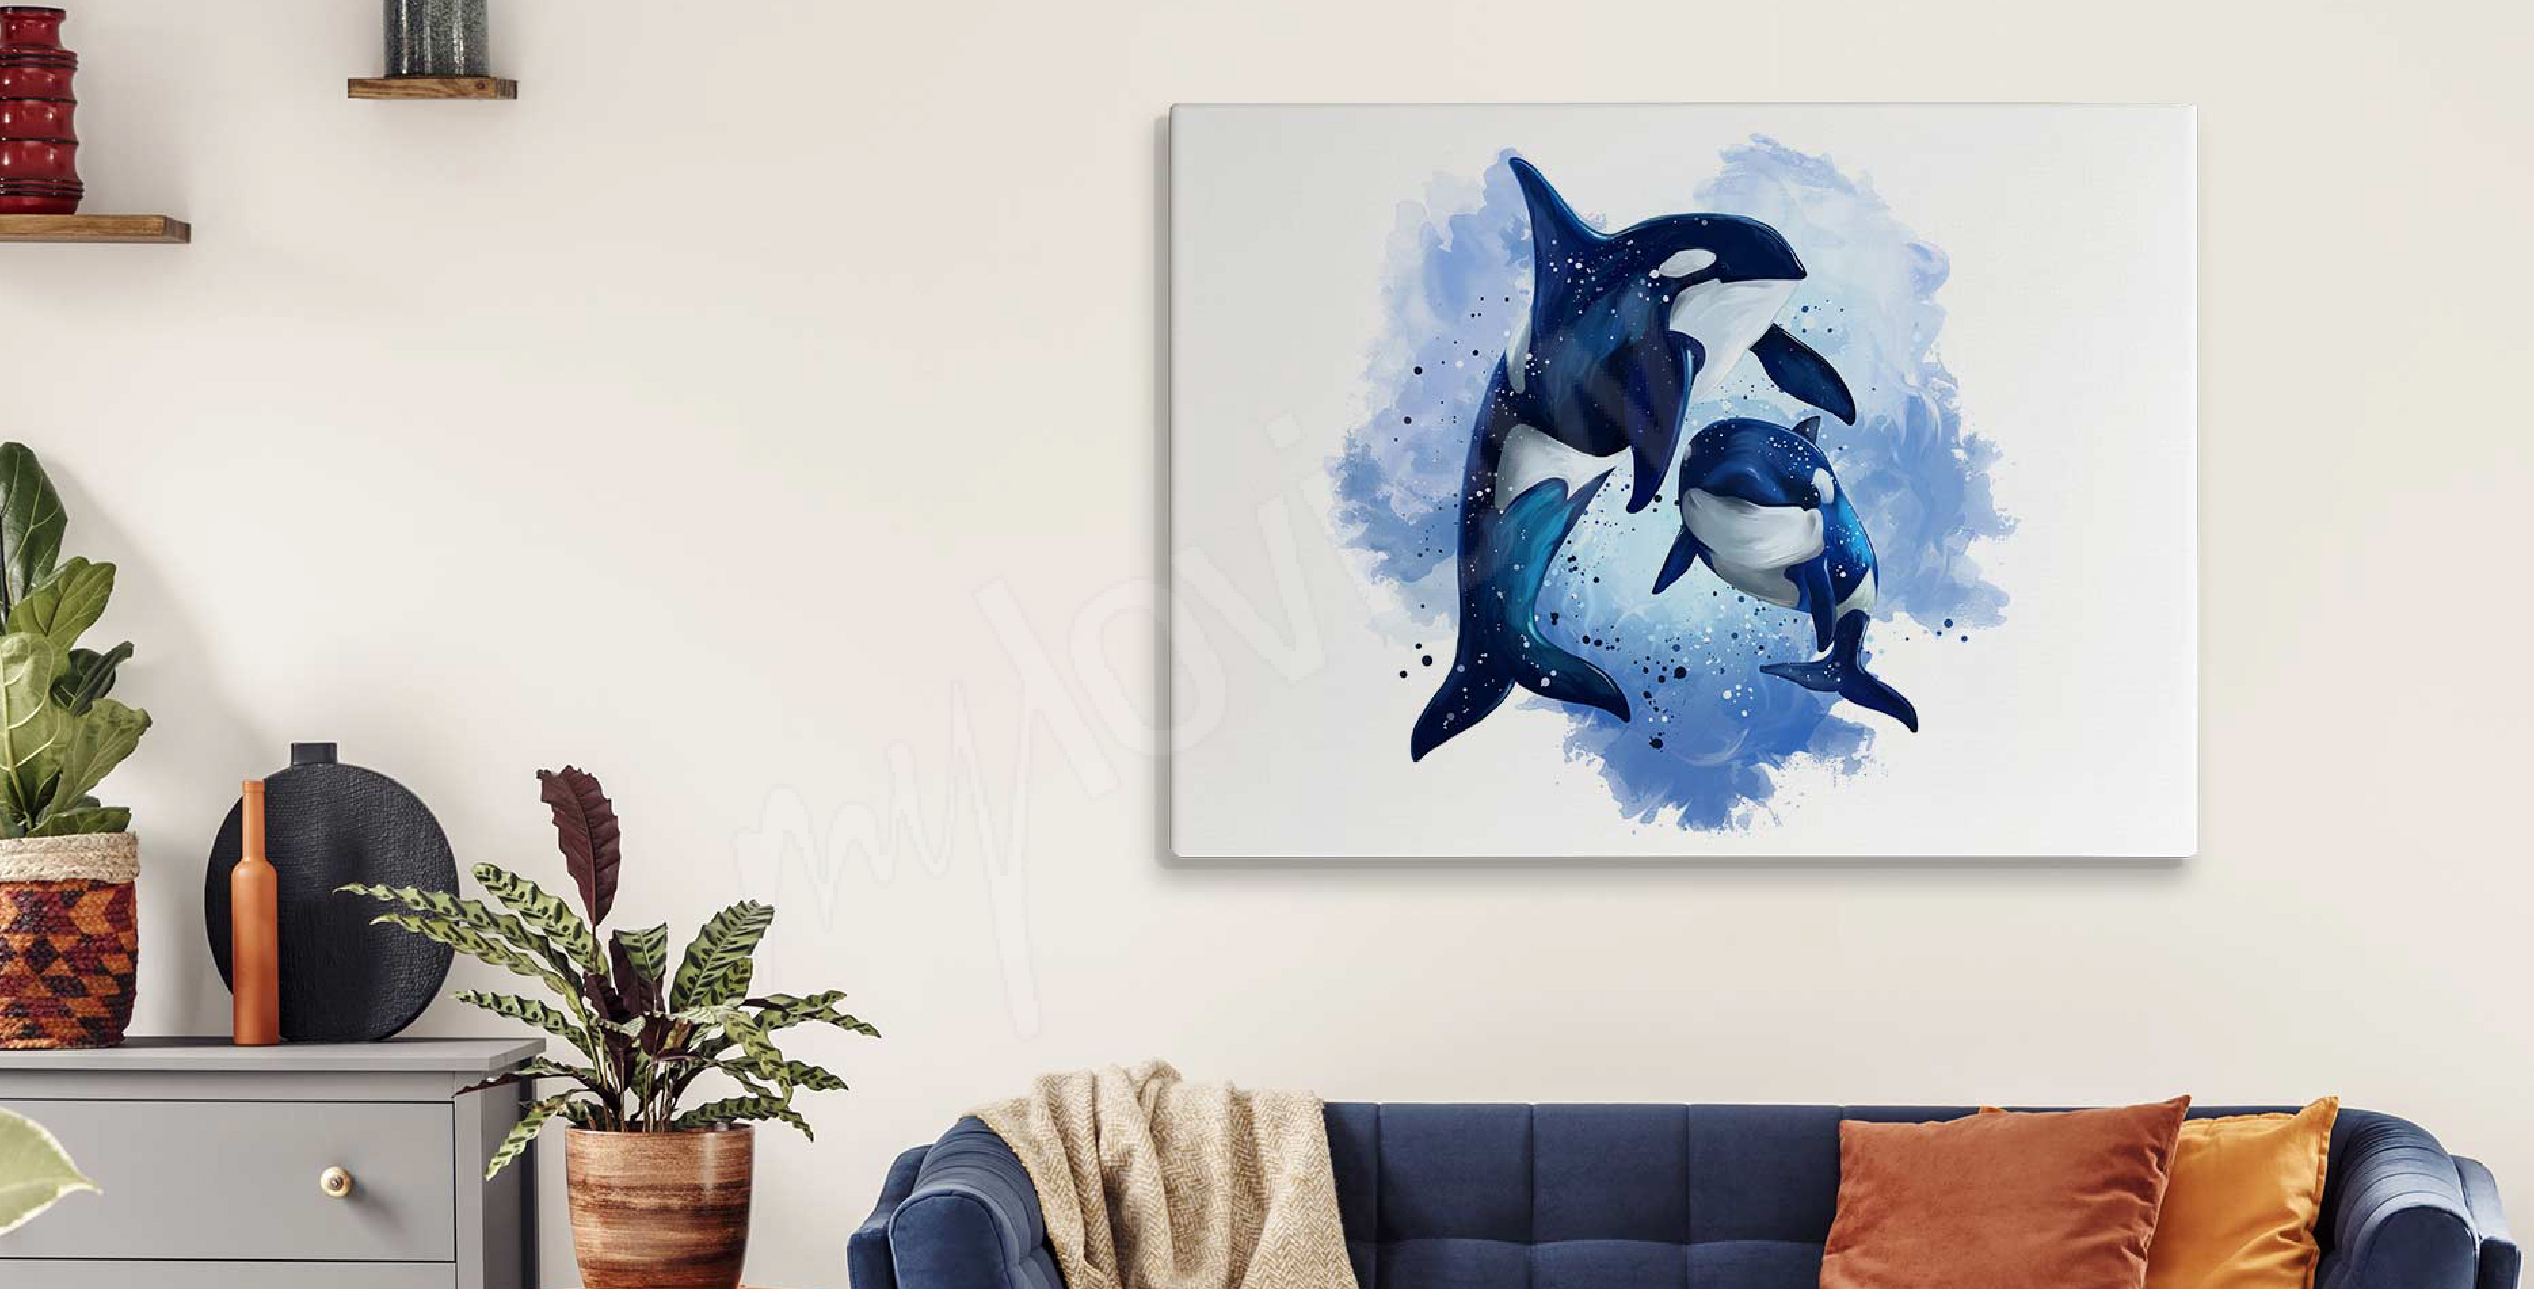 Aquarellbild abstrakt